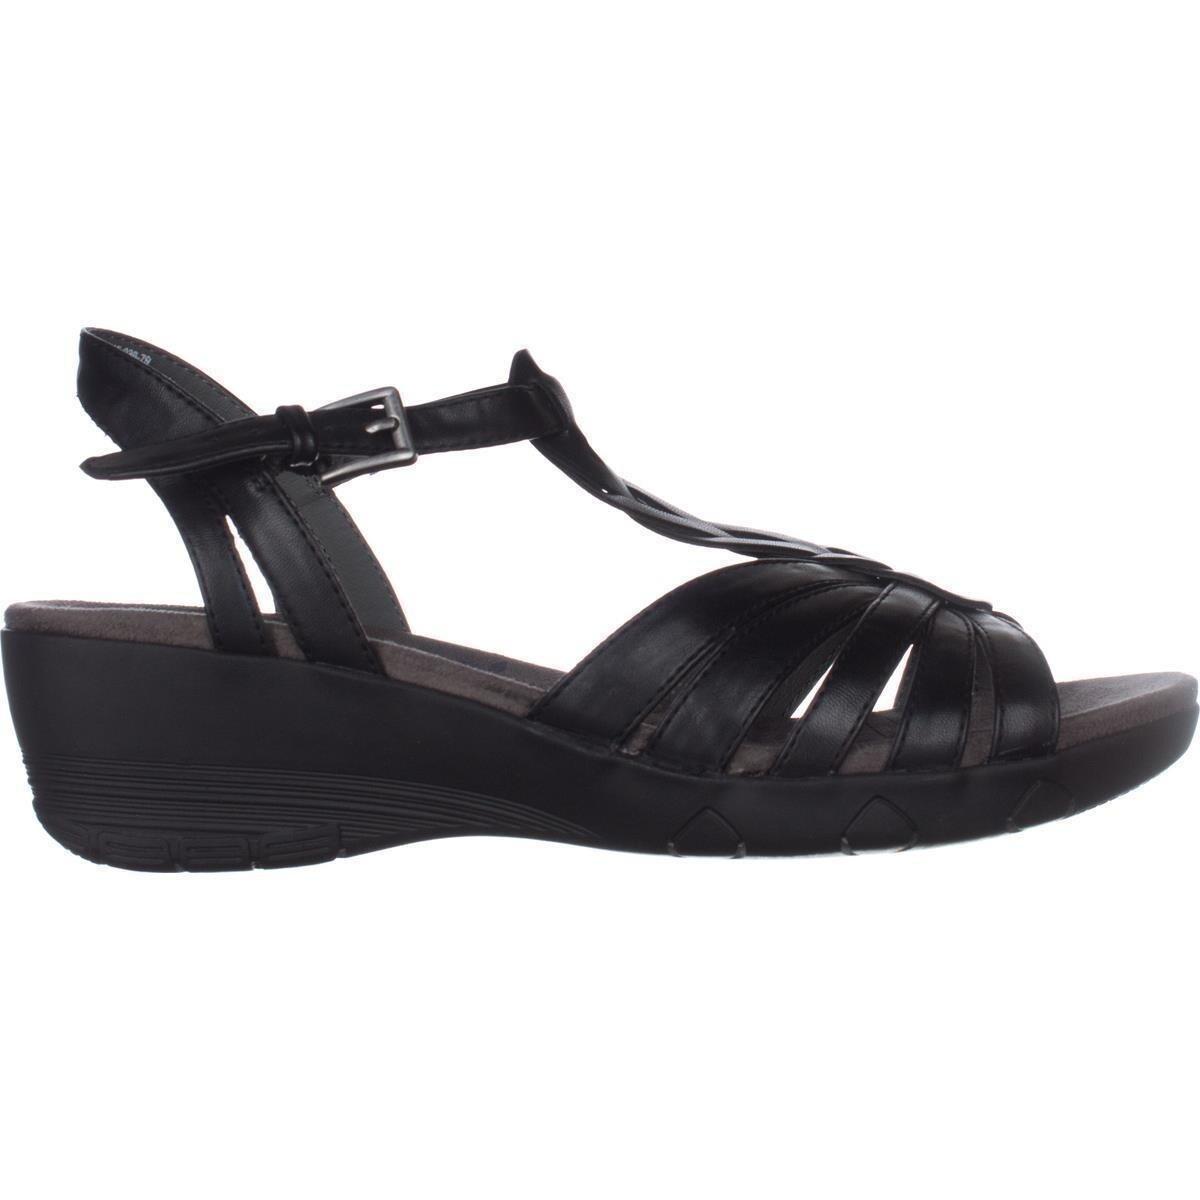 894f900feb72be Shop BareTraps Honora Memory Foam Wedge Sandals